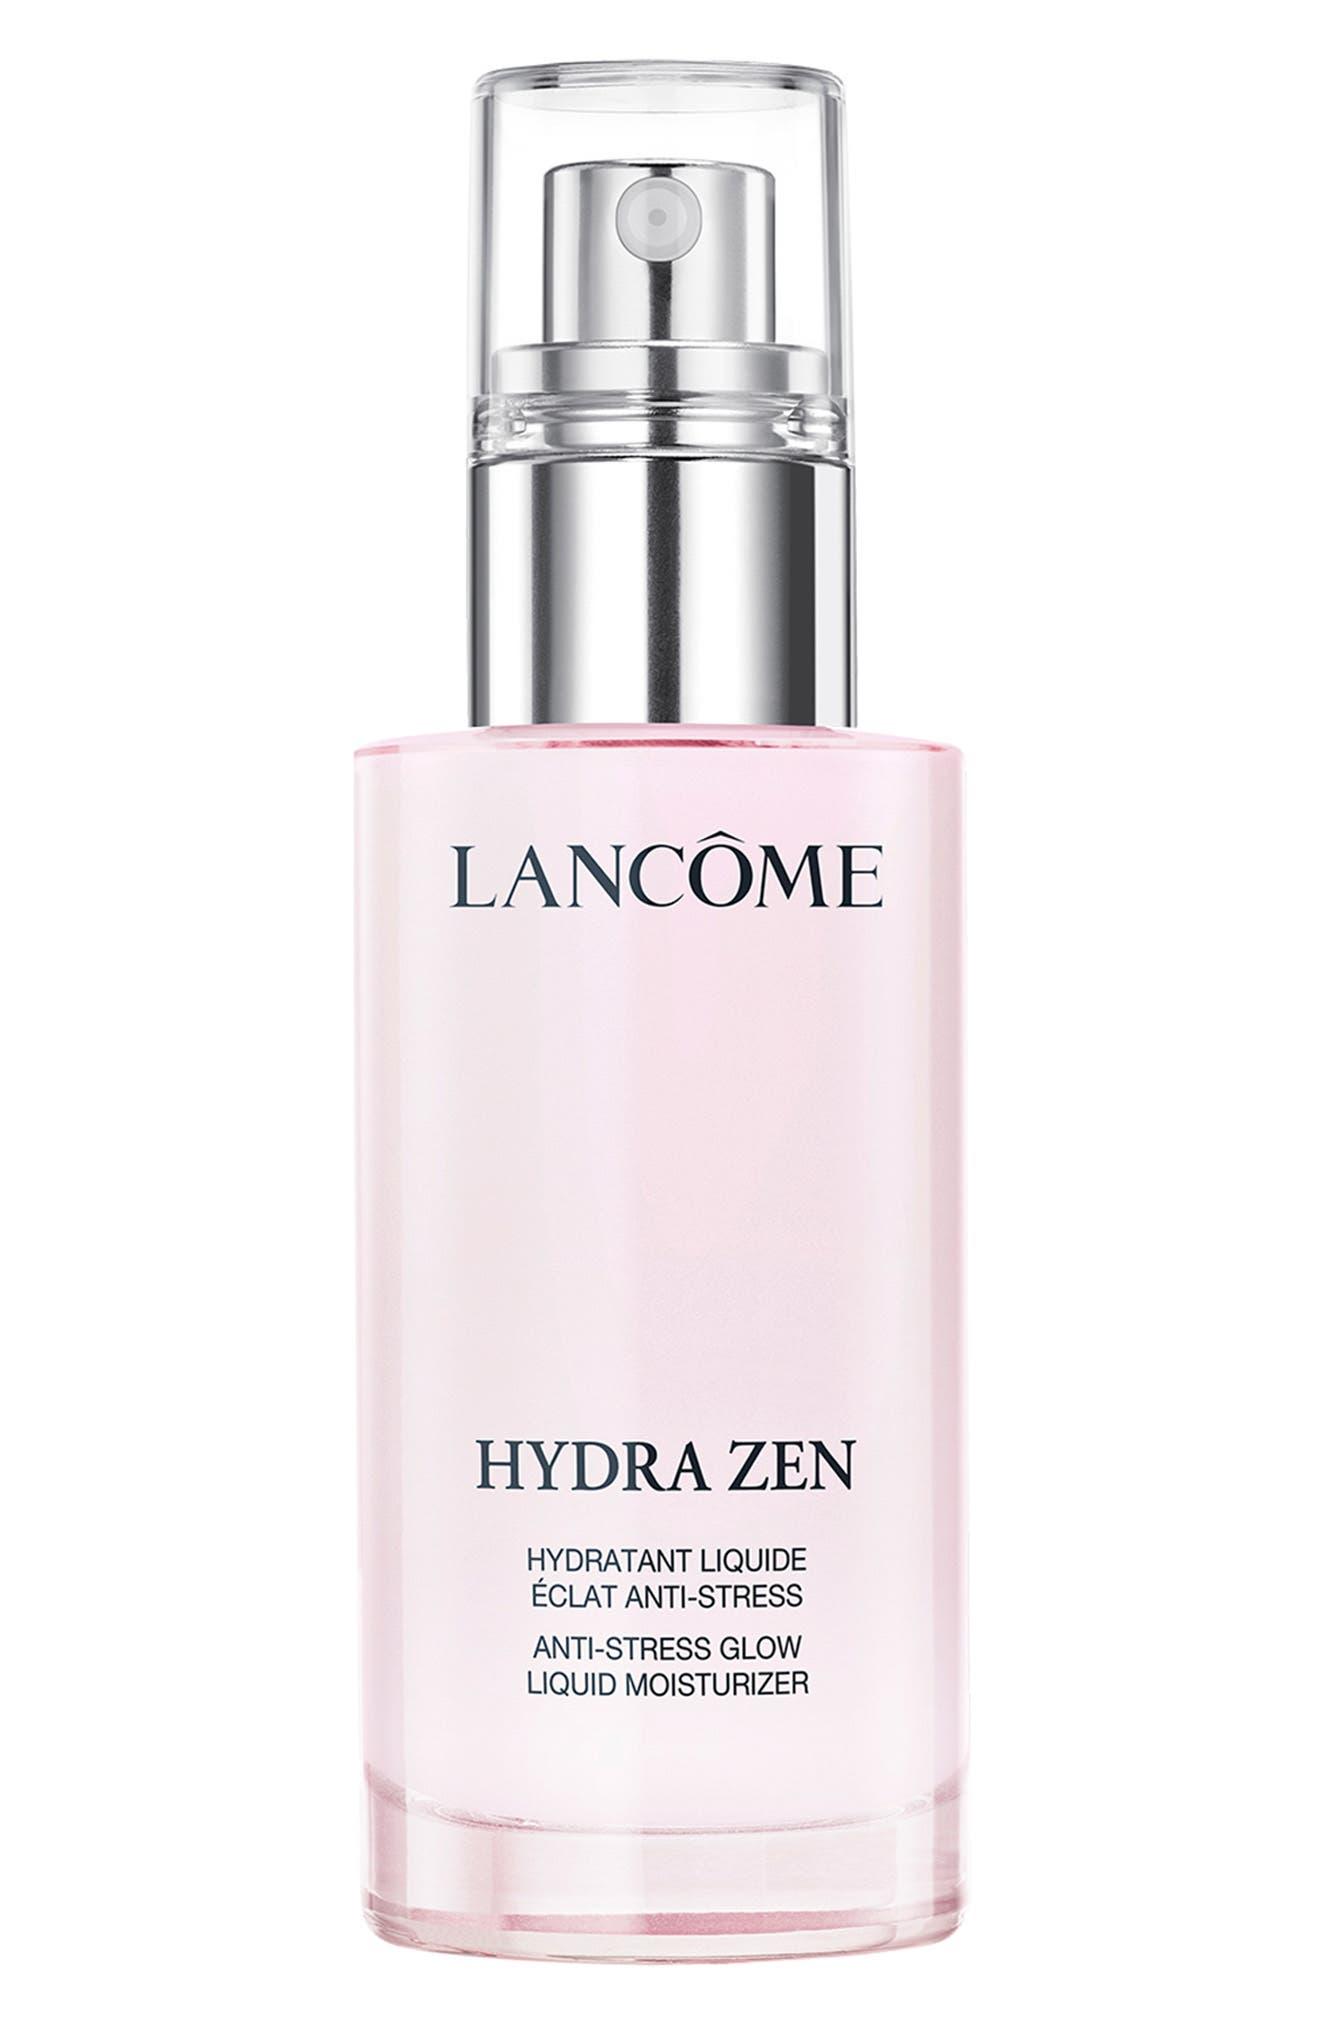 Hydra Zen Anti-Stress Glow Liquid Moisturizer | Nordstrom